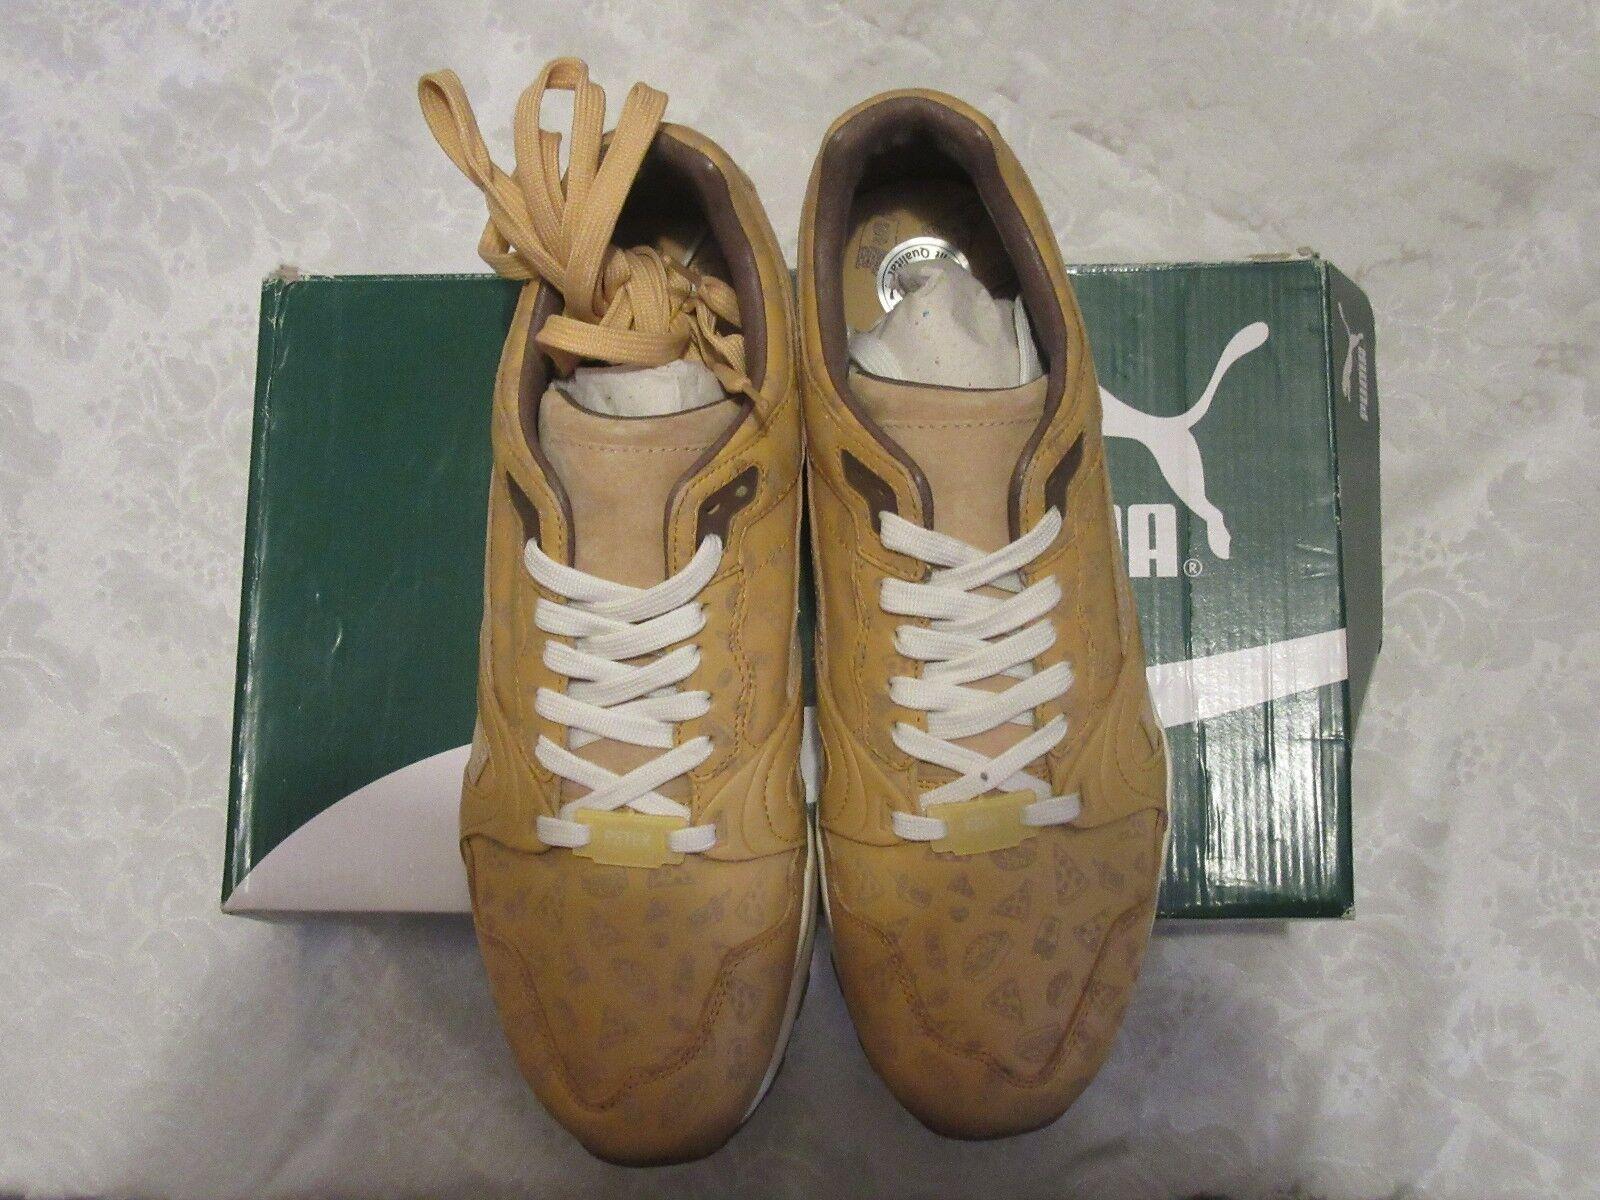 Puma XT2 Pizza & Burgers Sneakersnstuff 358496 01 Size 10.5 Sneakers